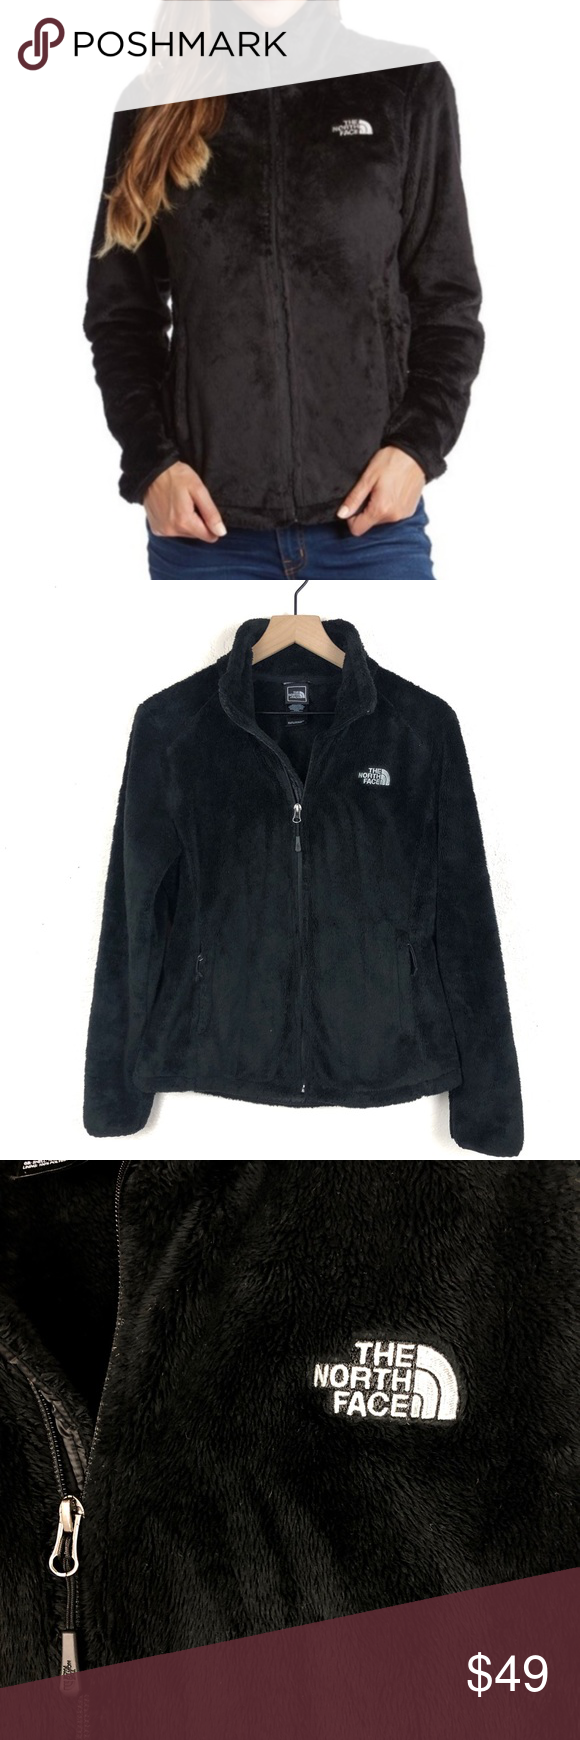 Women S North Face Osito Fleece Black North Face Classic Jacket North Face Fleece [ 1740 x 580 Pixel ]